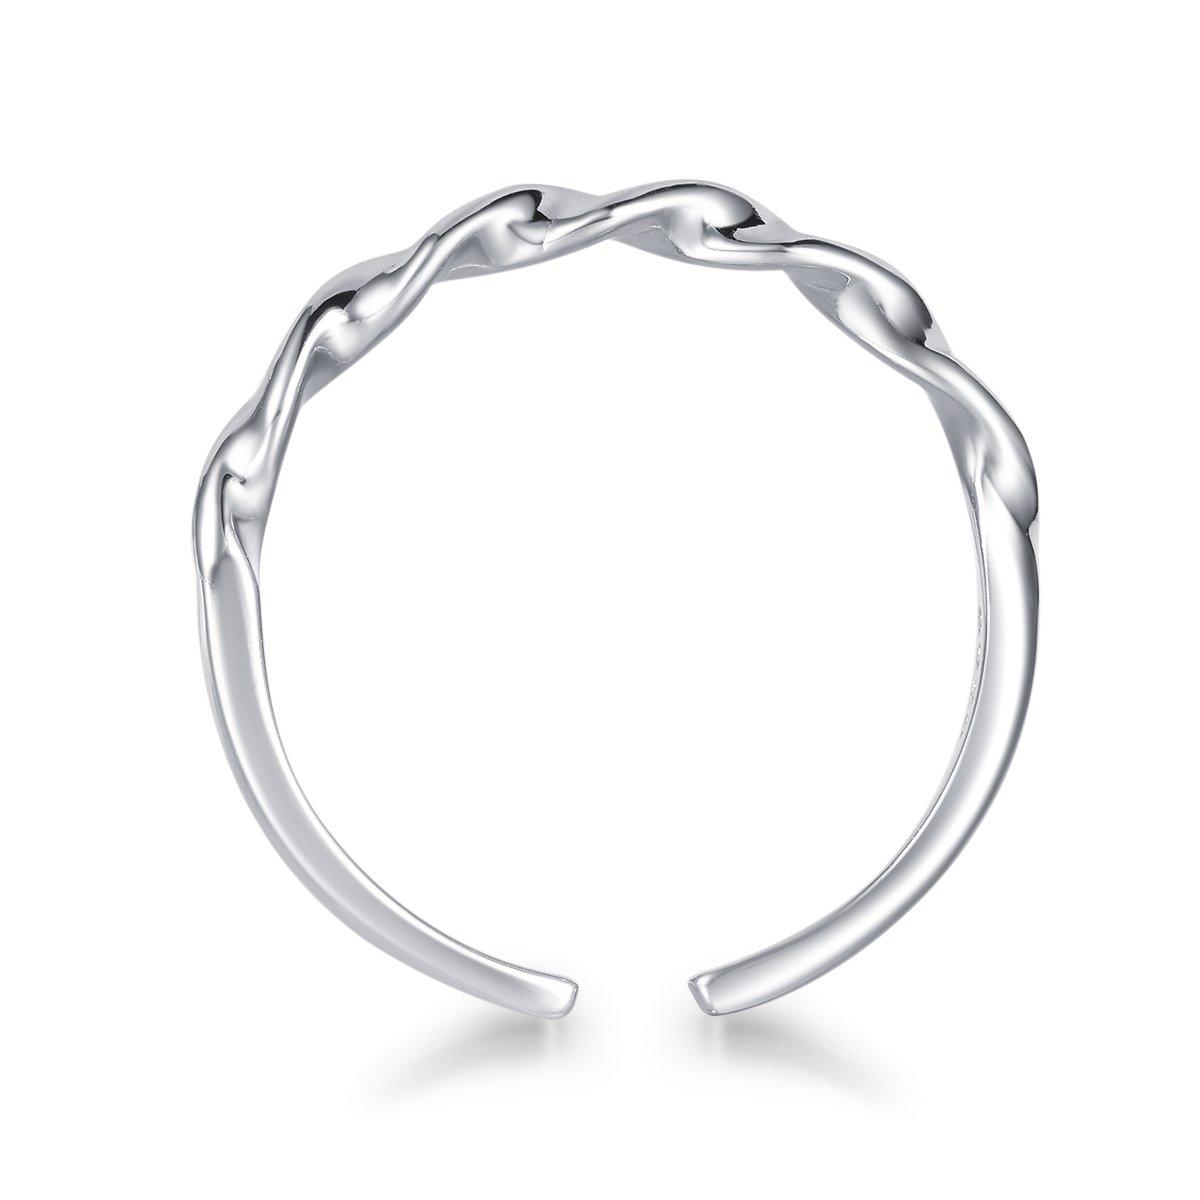 LYTOPTOP Women Waves Ring Fashion Sterling Sliver Jewellery Thumb Rings Adjustable Open Finger Ring Gift Box VXfbMbm